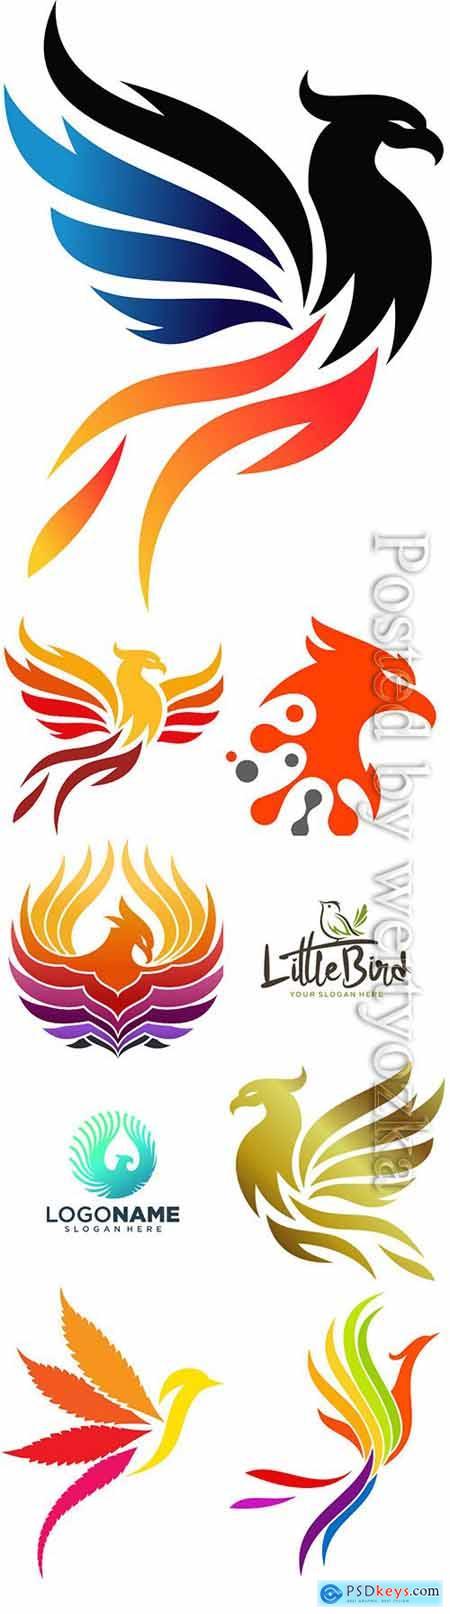 Phoenix logo collection vector illustration